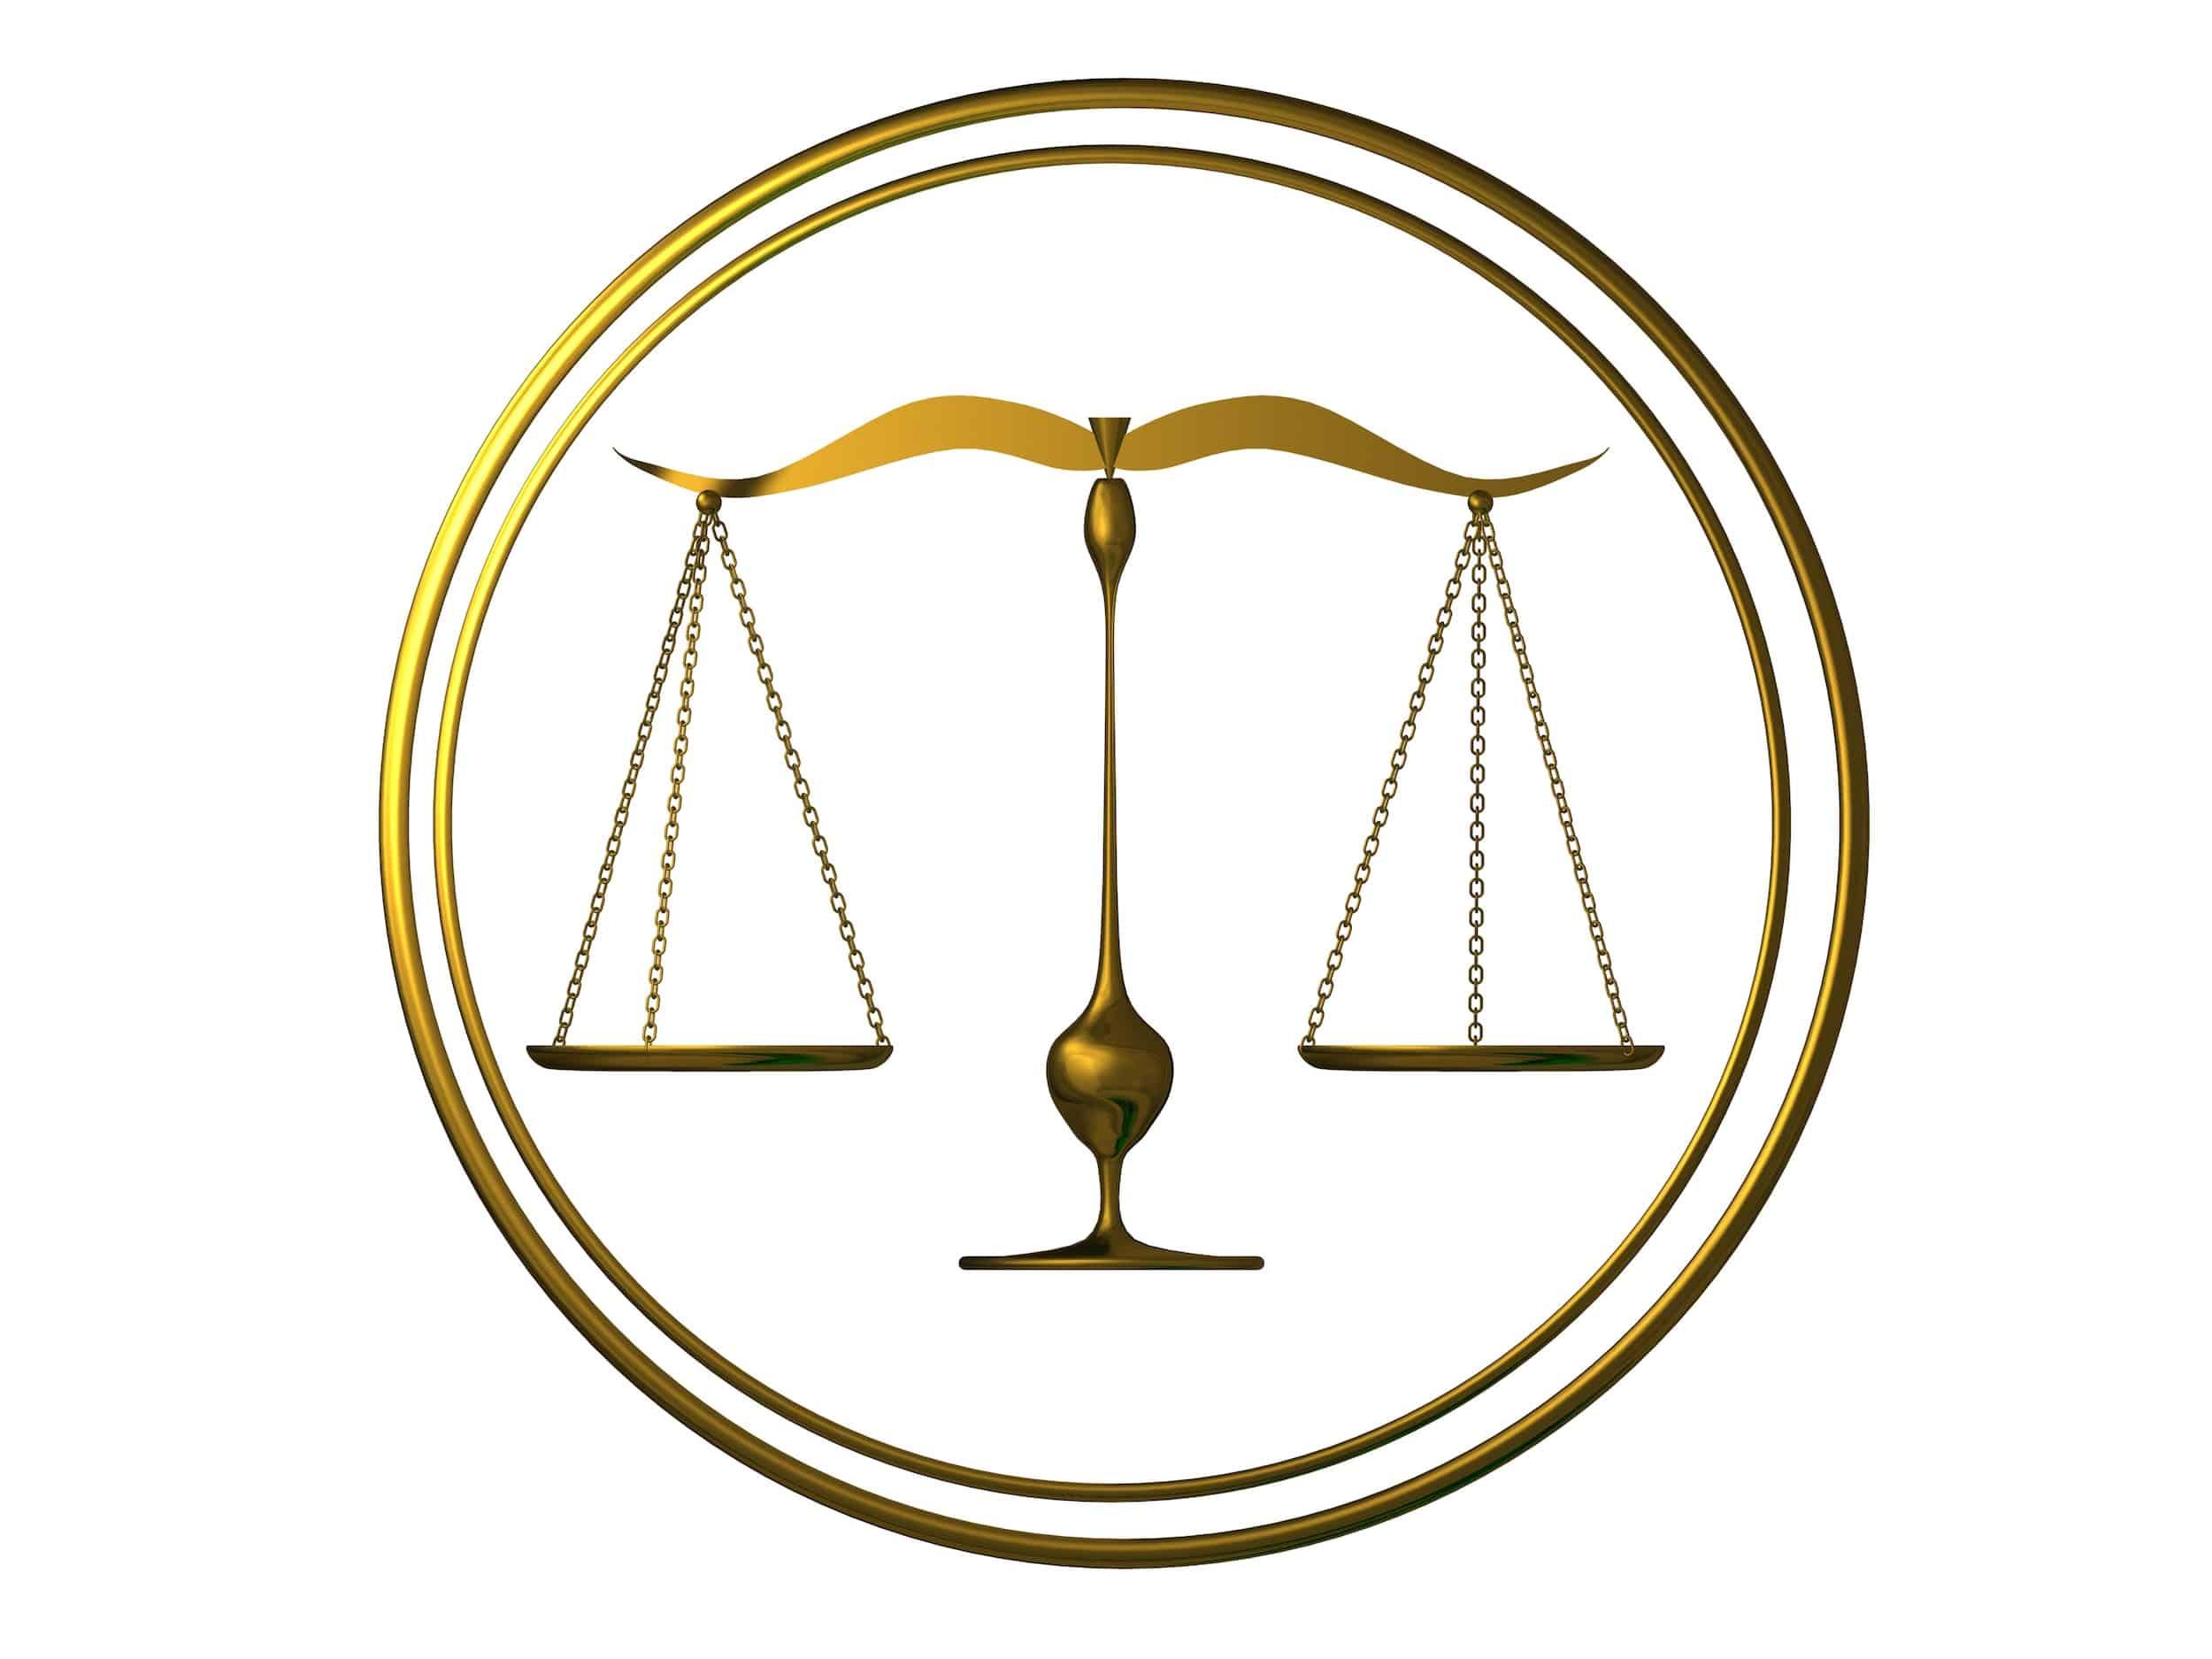 justice scales balanced